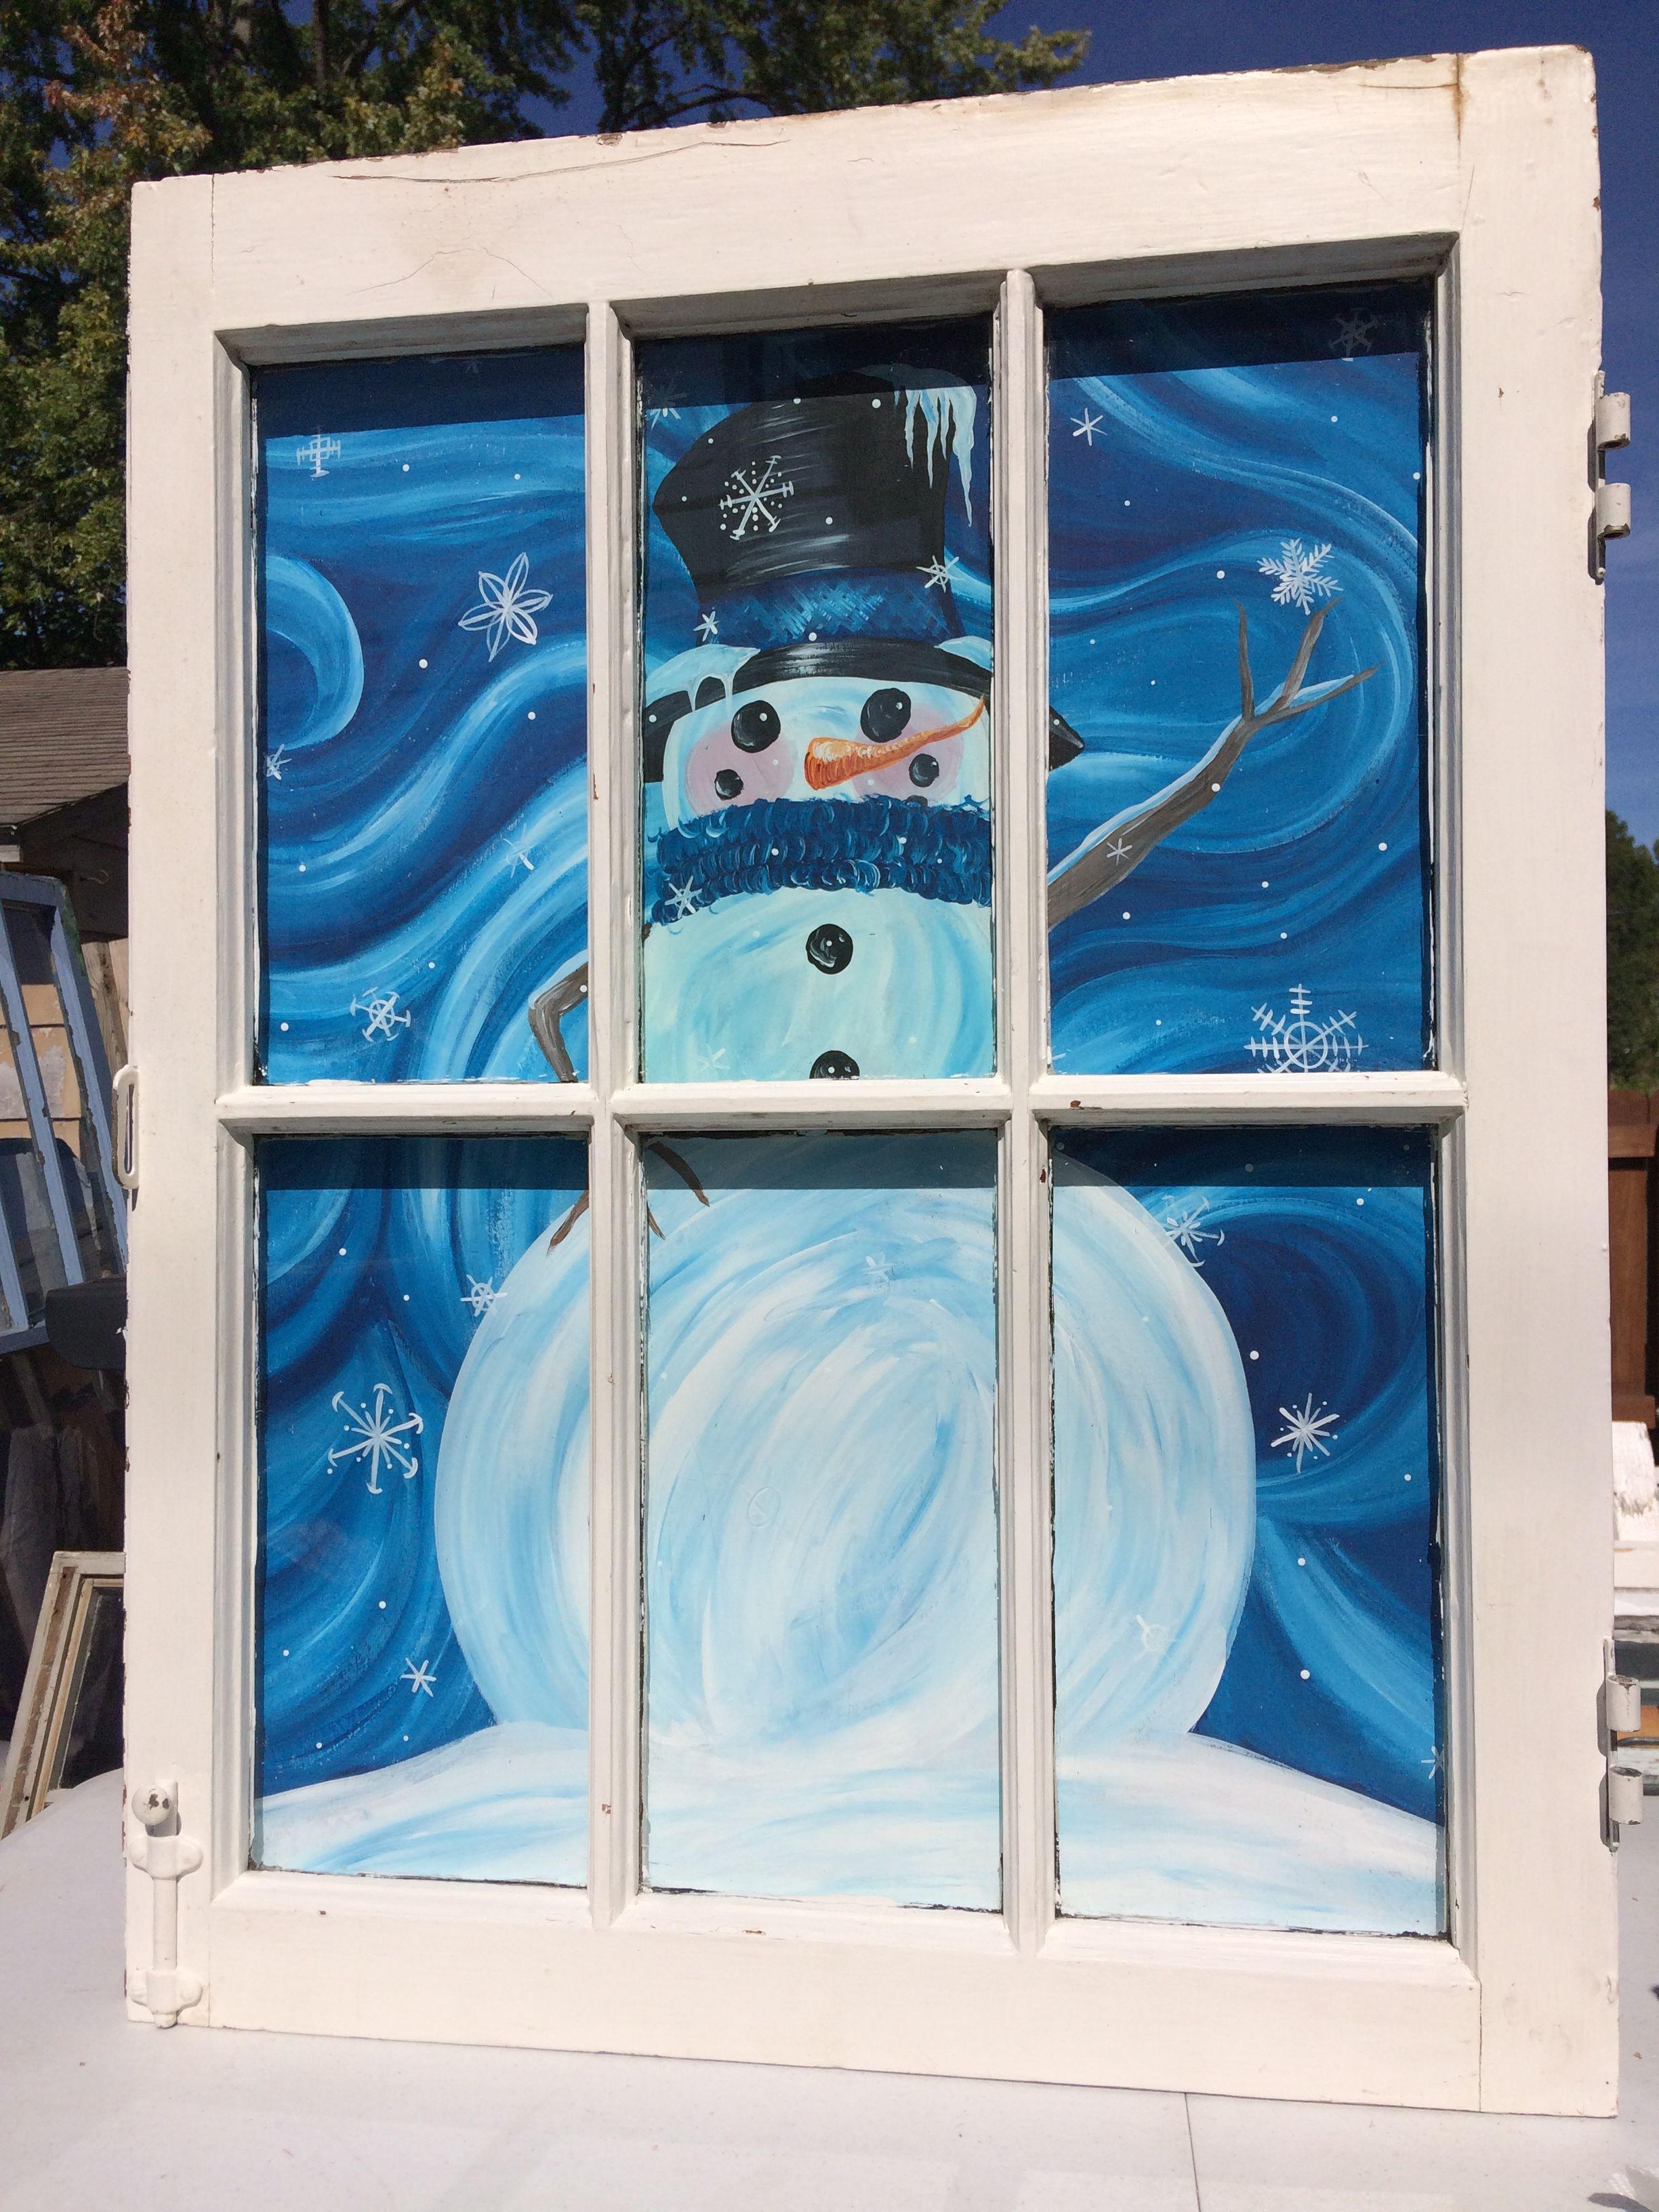 3 pane window ideas  pin by sandi allen on painted windows and screens  pinterest